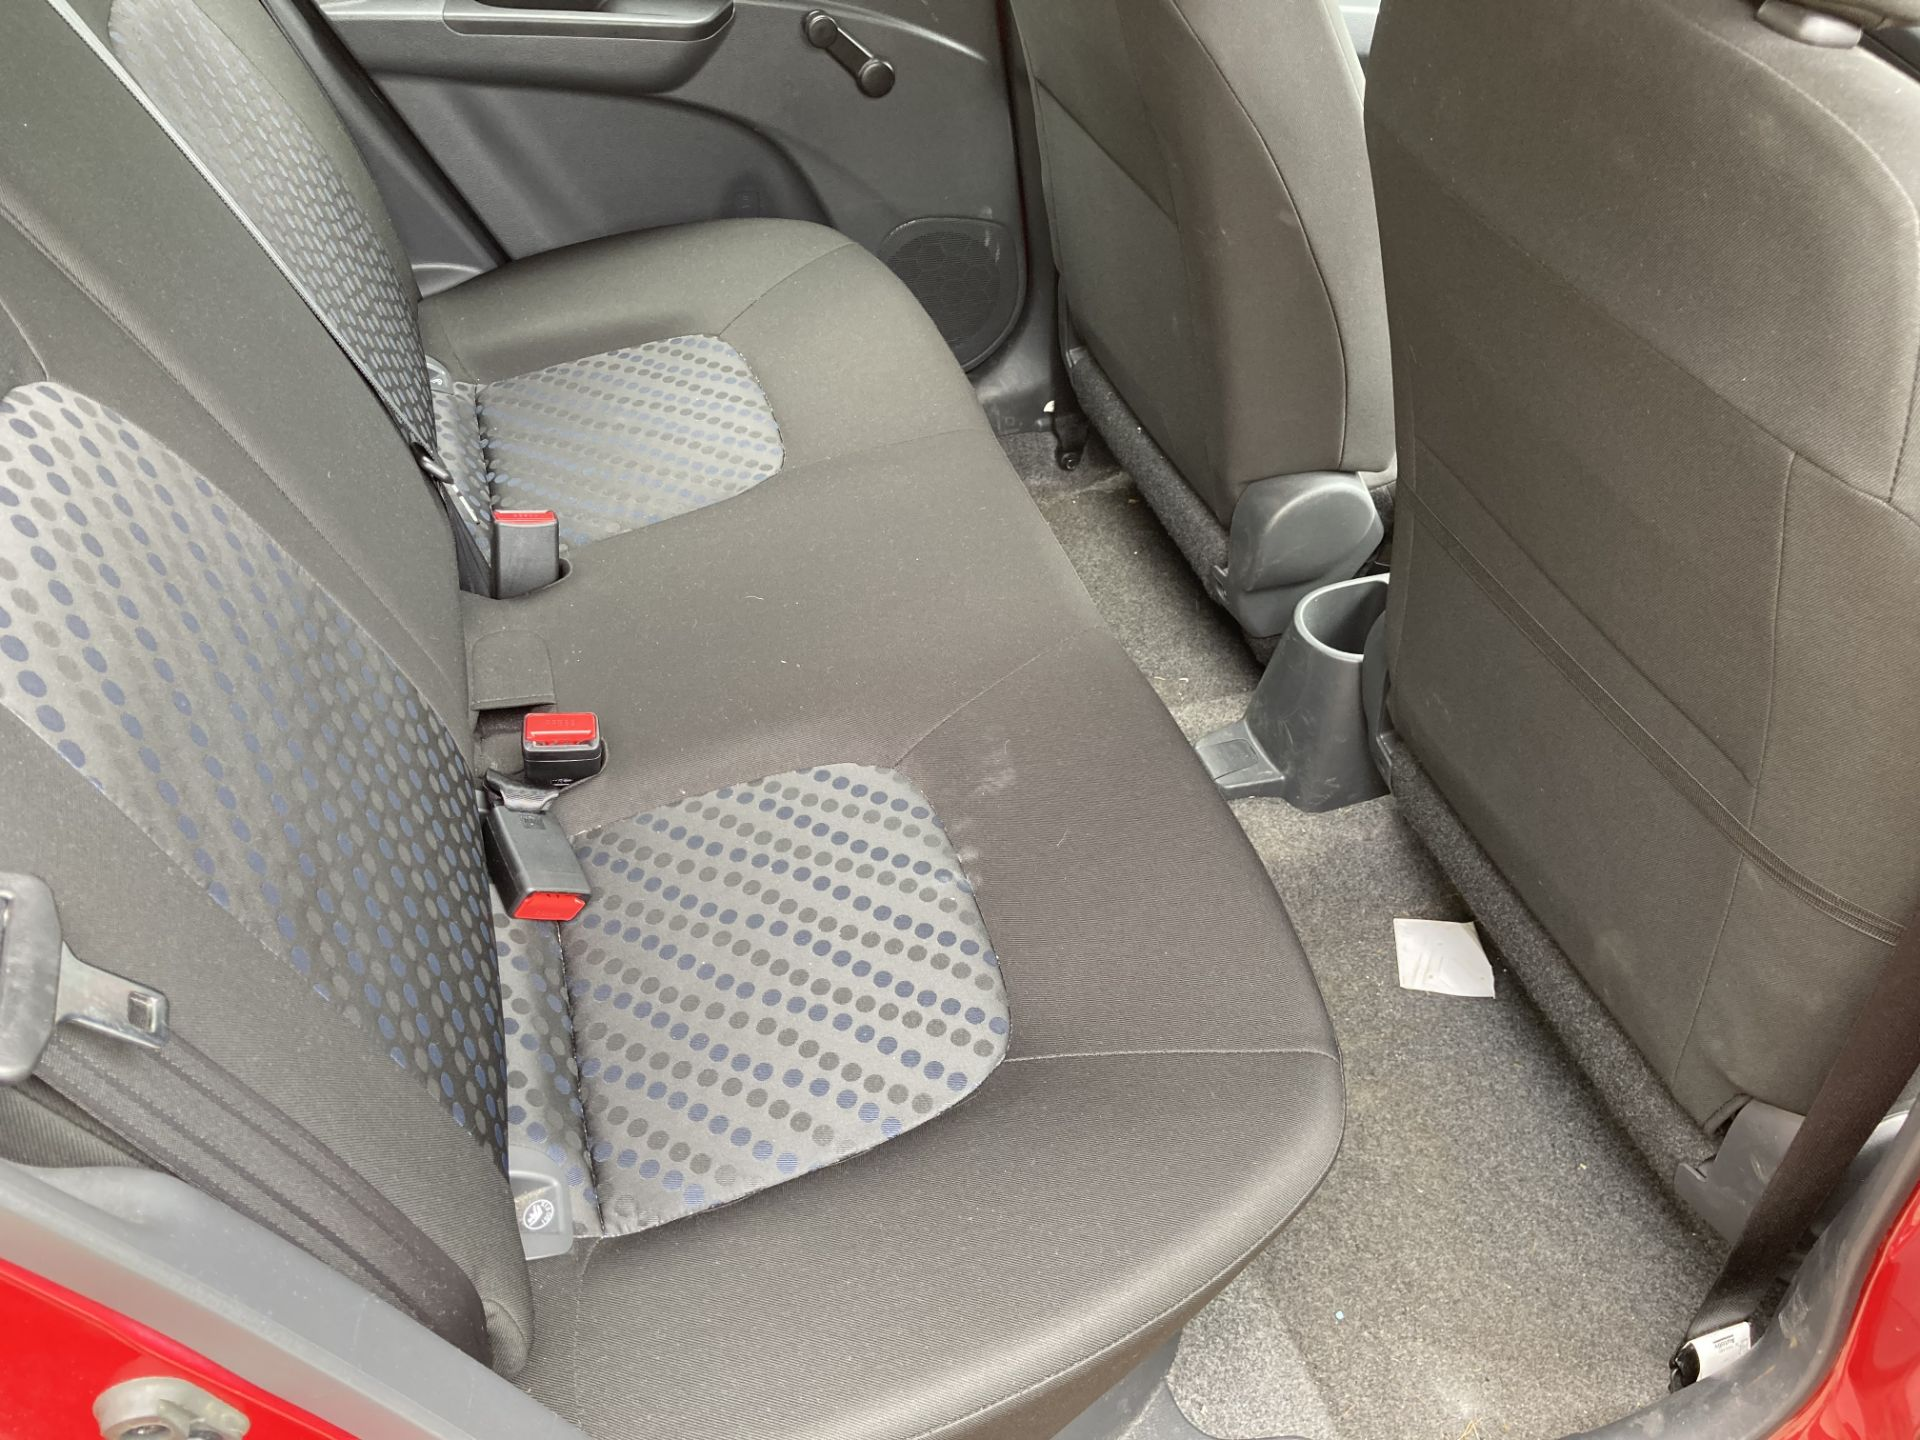 ON INSTRUCTIONS OF THE INSOLVENCY SERVICE SUZUKI CELERIO SZ2 5 door hatchback - petrol - red Reg - Image 14 of 15